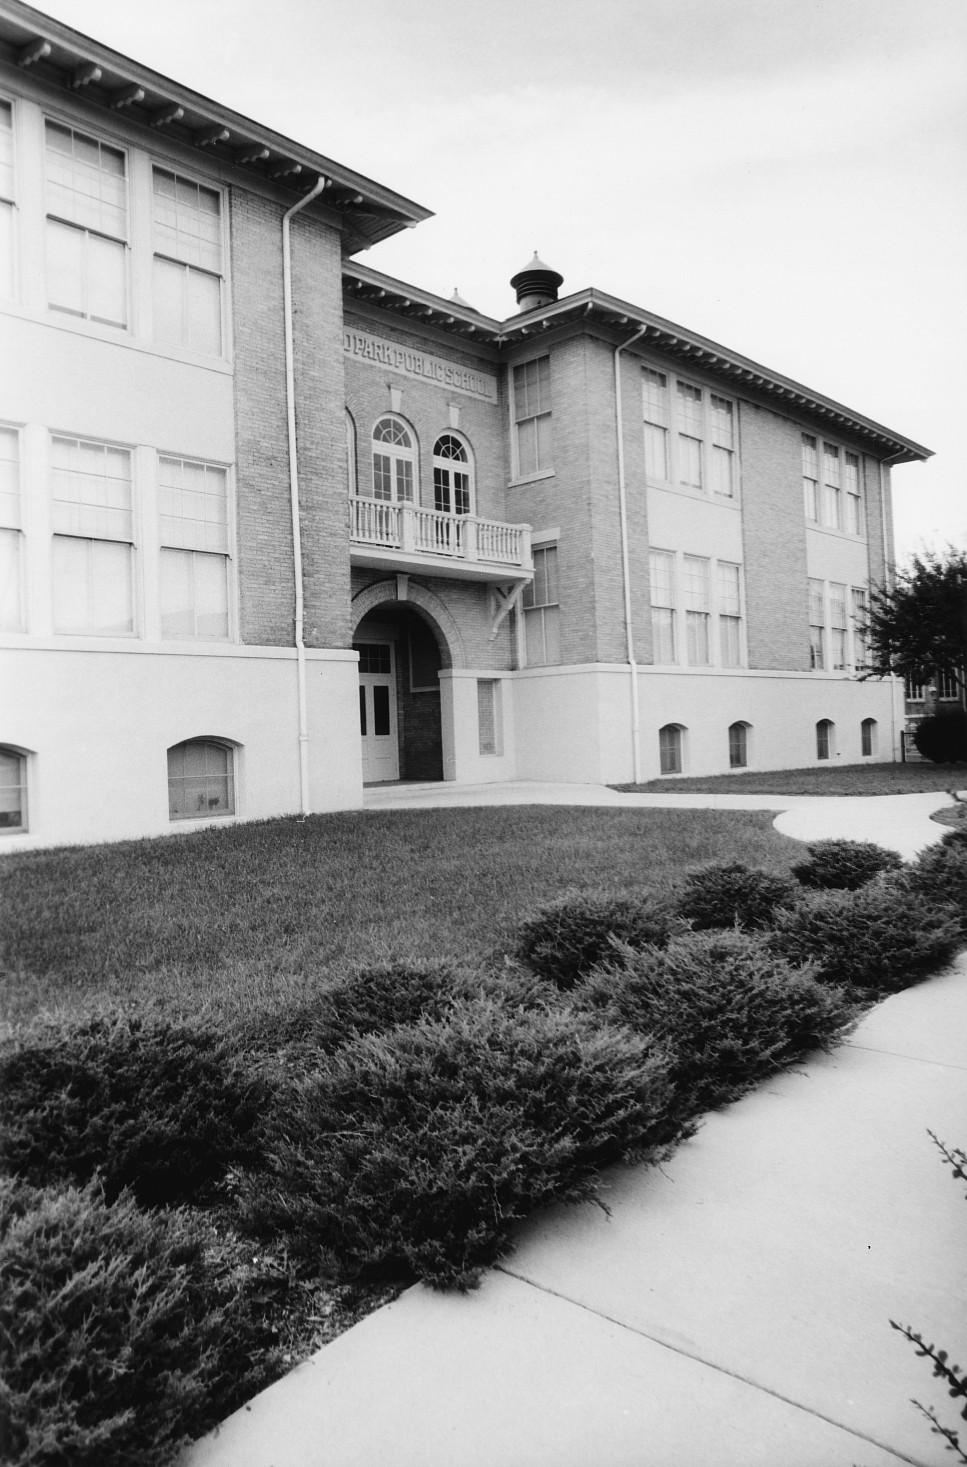 Highland Park Public School (Brookland Park Plaza)